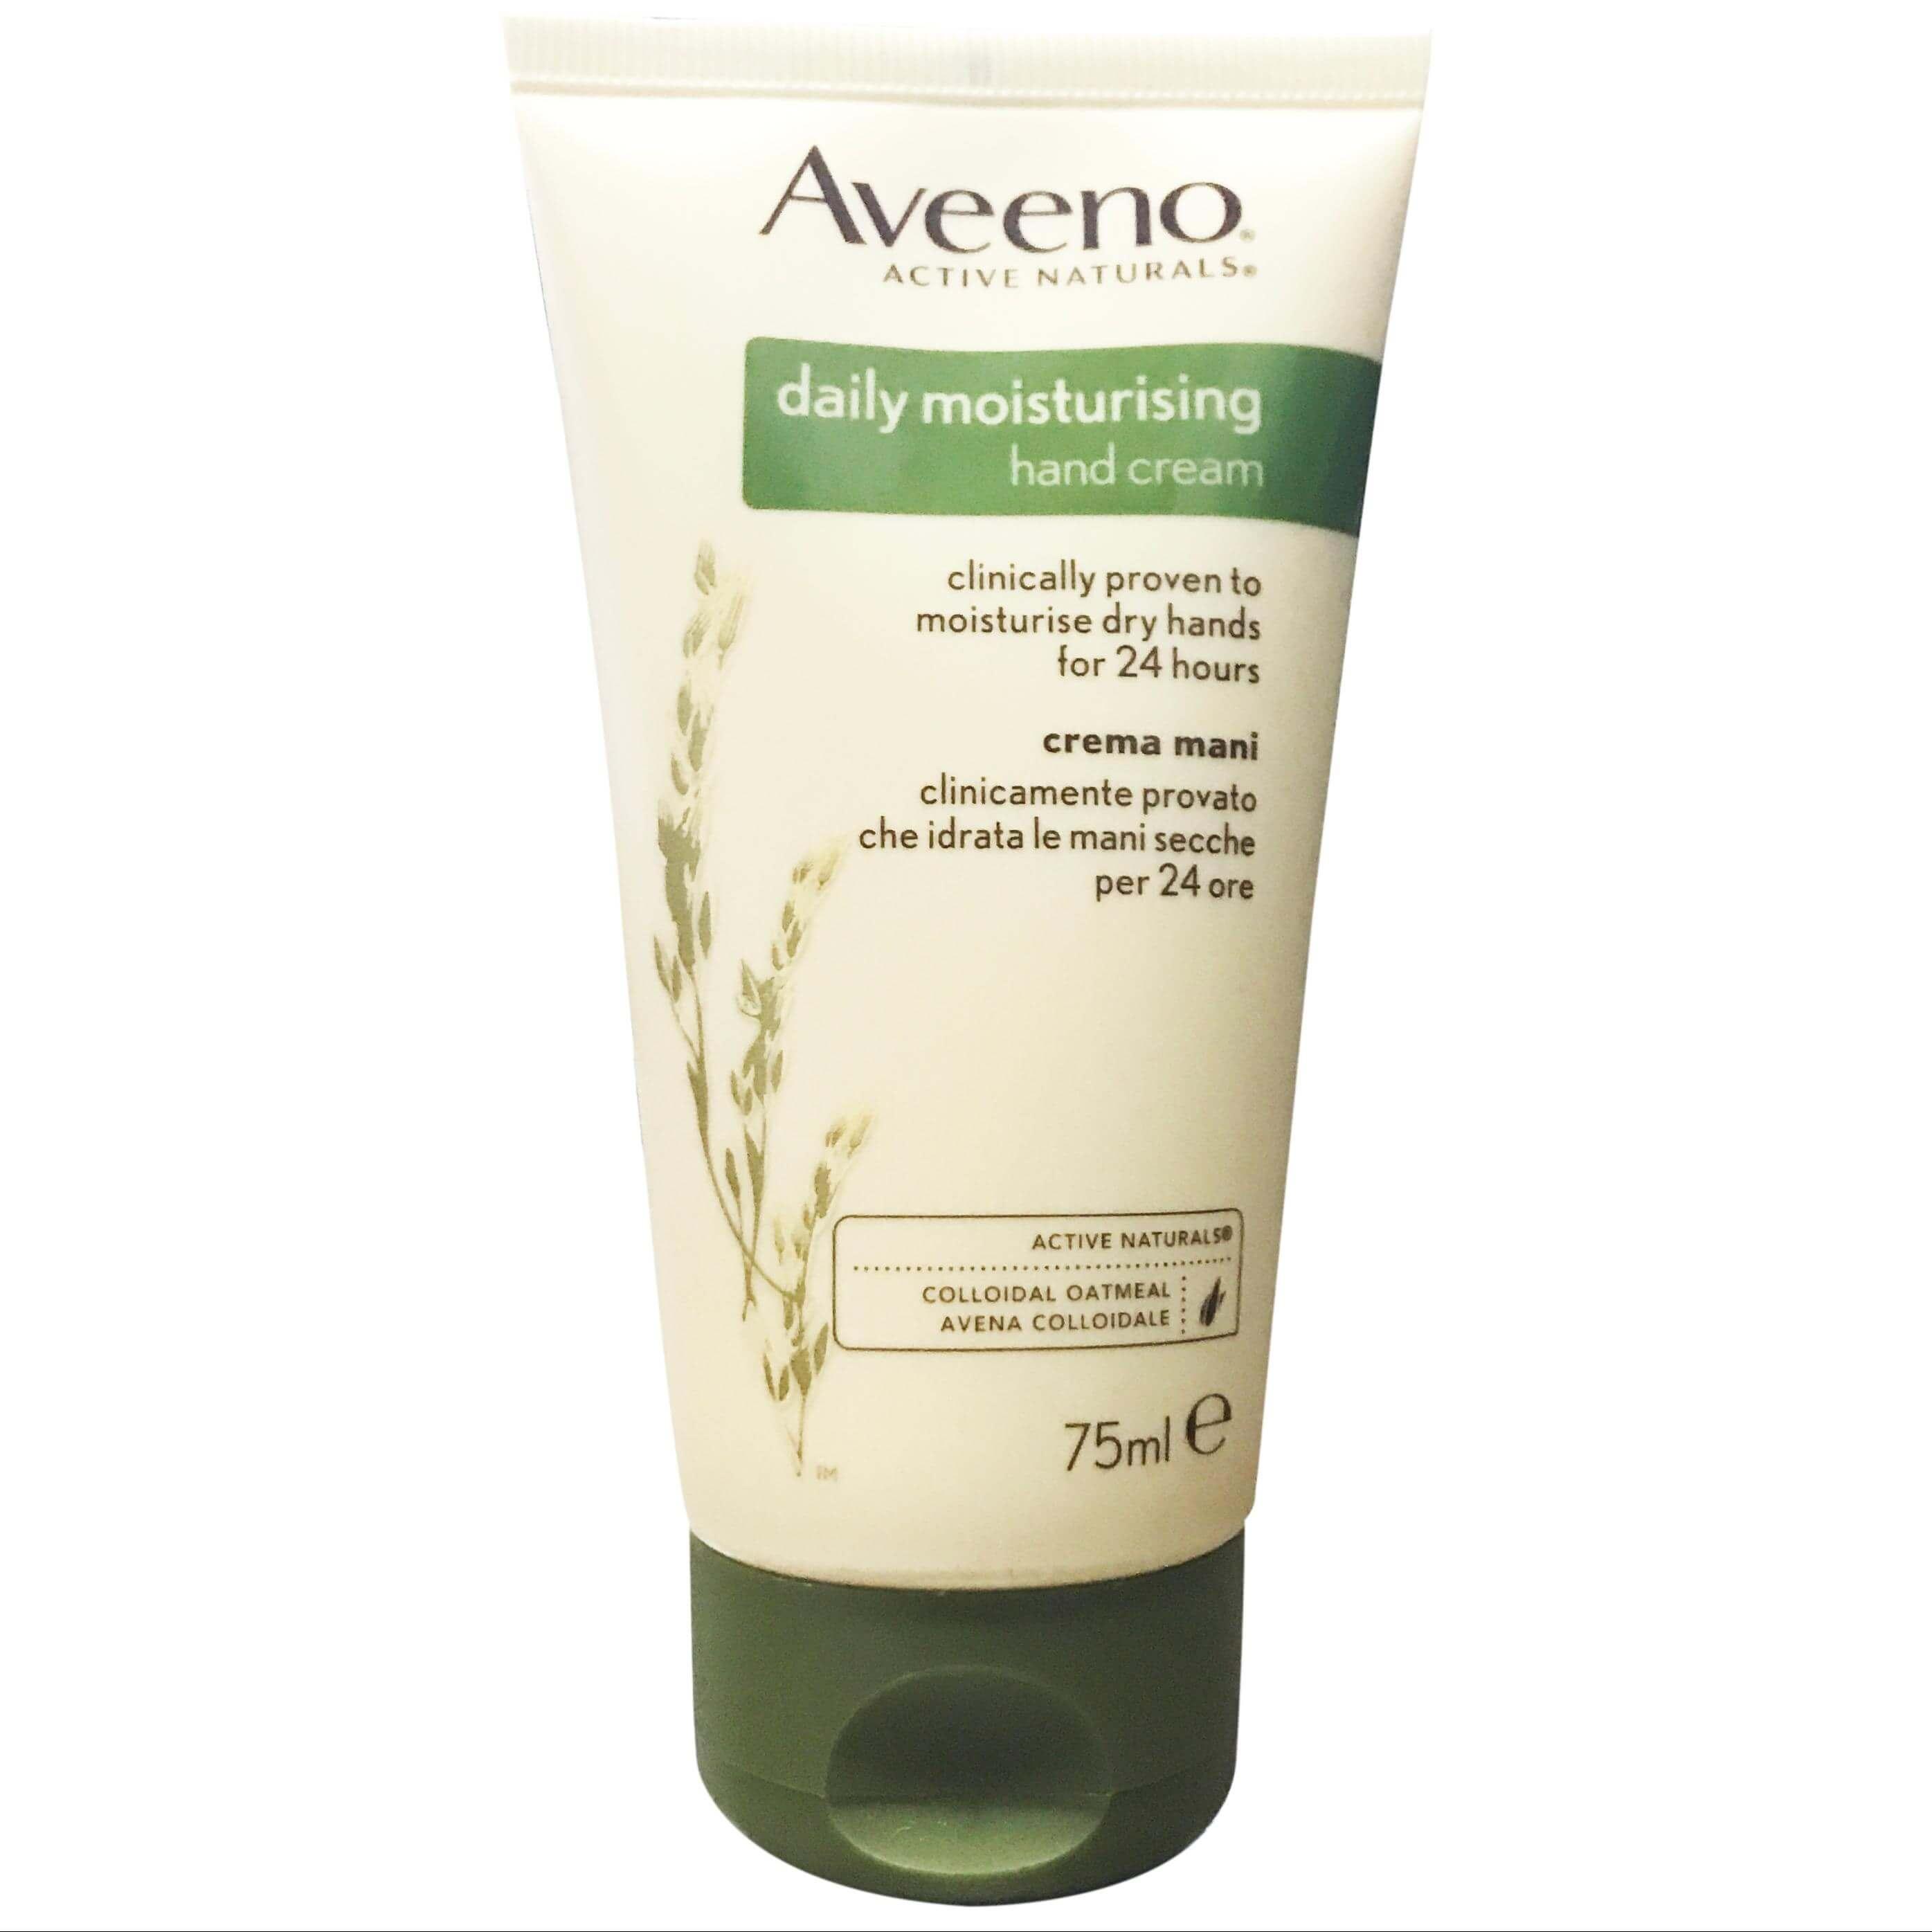 Aveeno Daily Moisturising Hand Cream Κρέμα Χεριών Καθημερινής Περιποίησης για 24ωρη Ενυδάτωση 75ml